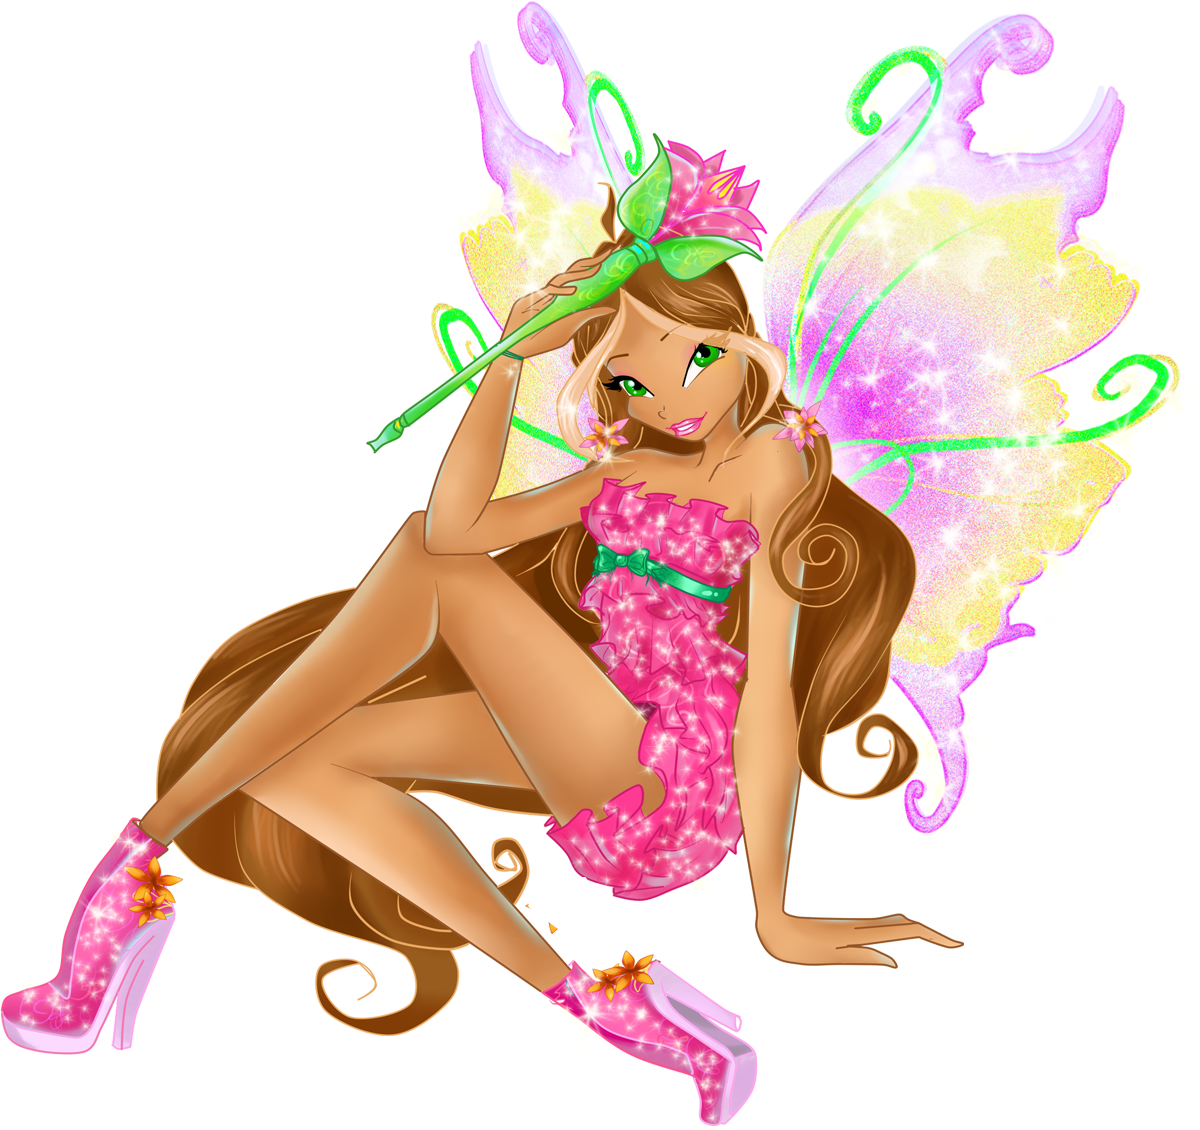 image flora mythix 2d fanmadepng winx club wiki